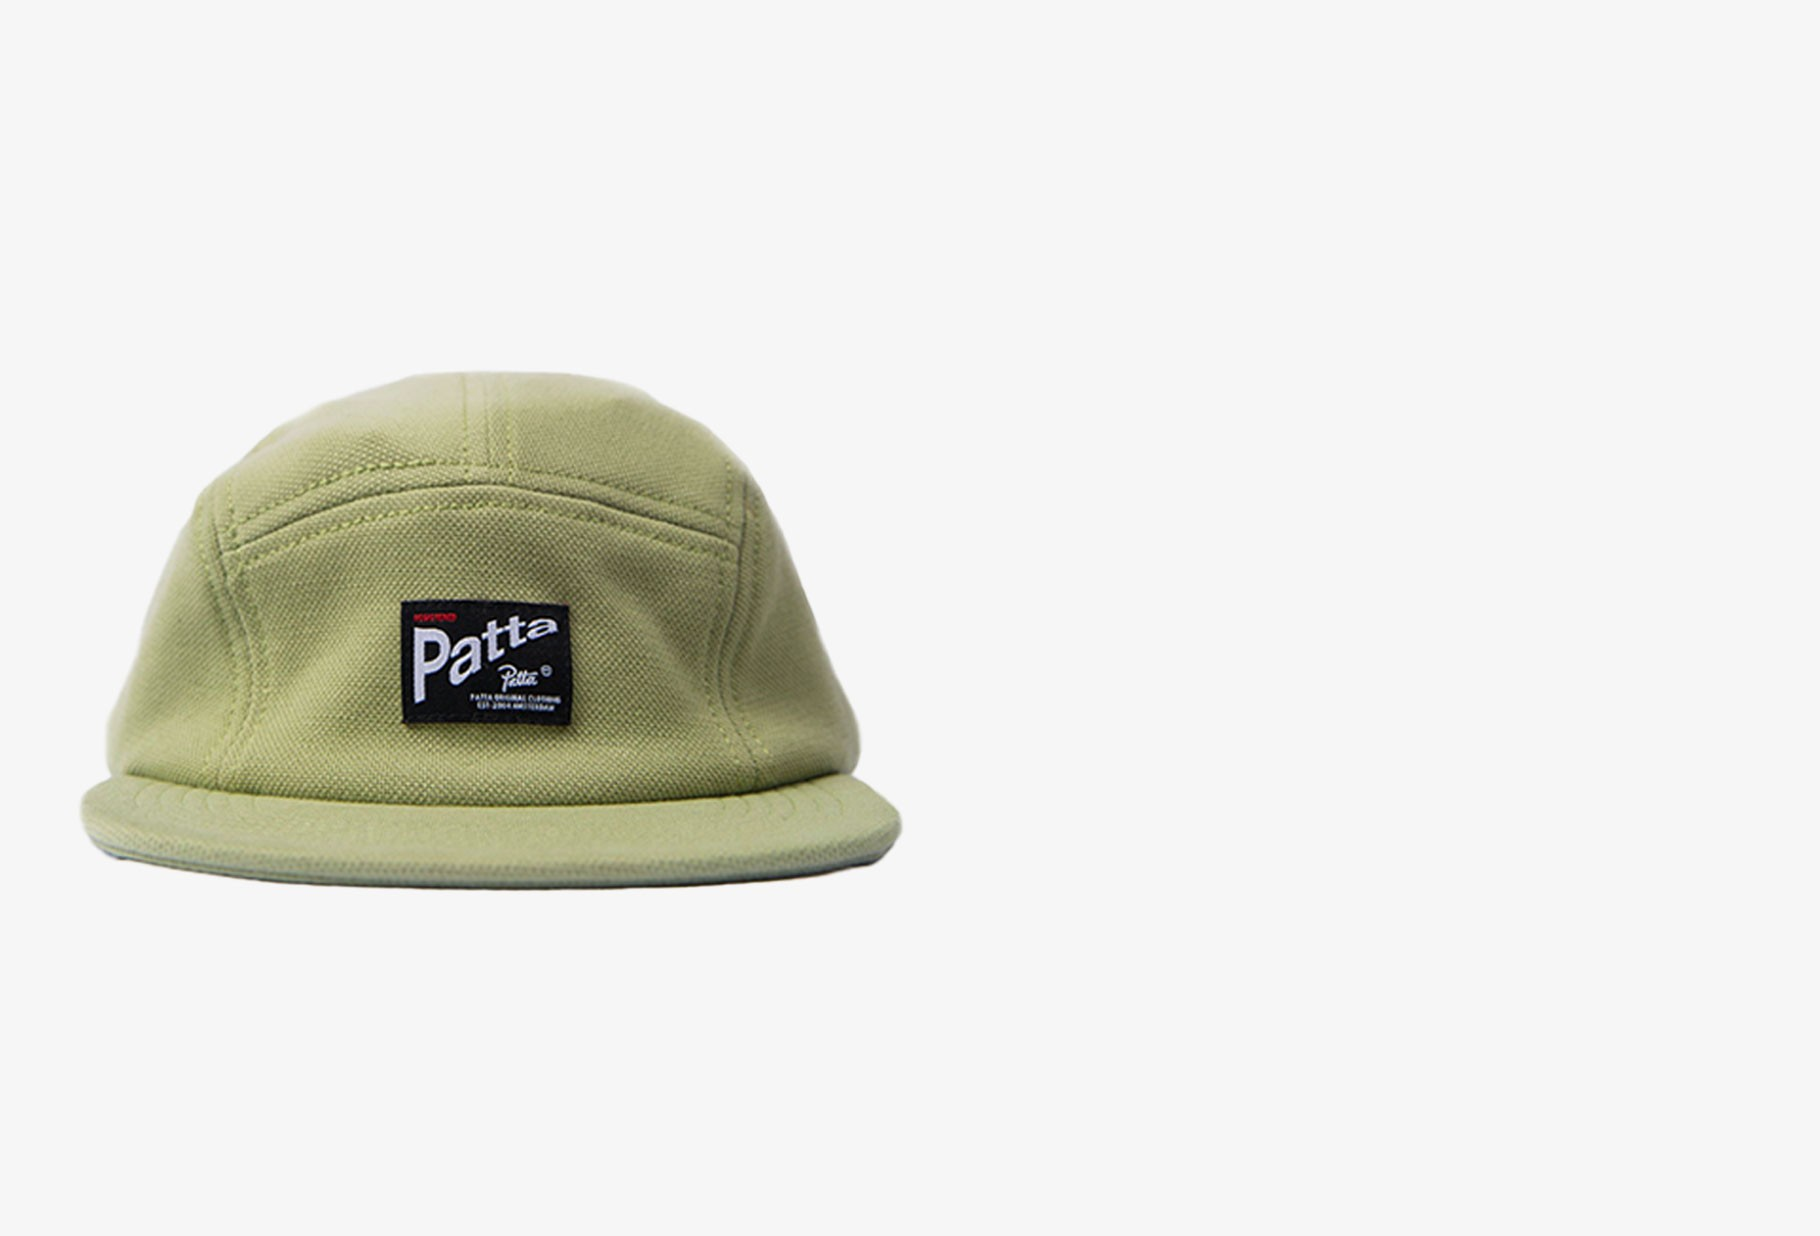 PATTA / Patta pique camp hat Calliste green